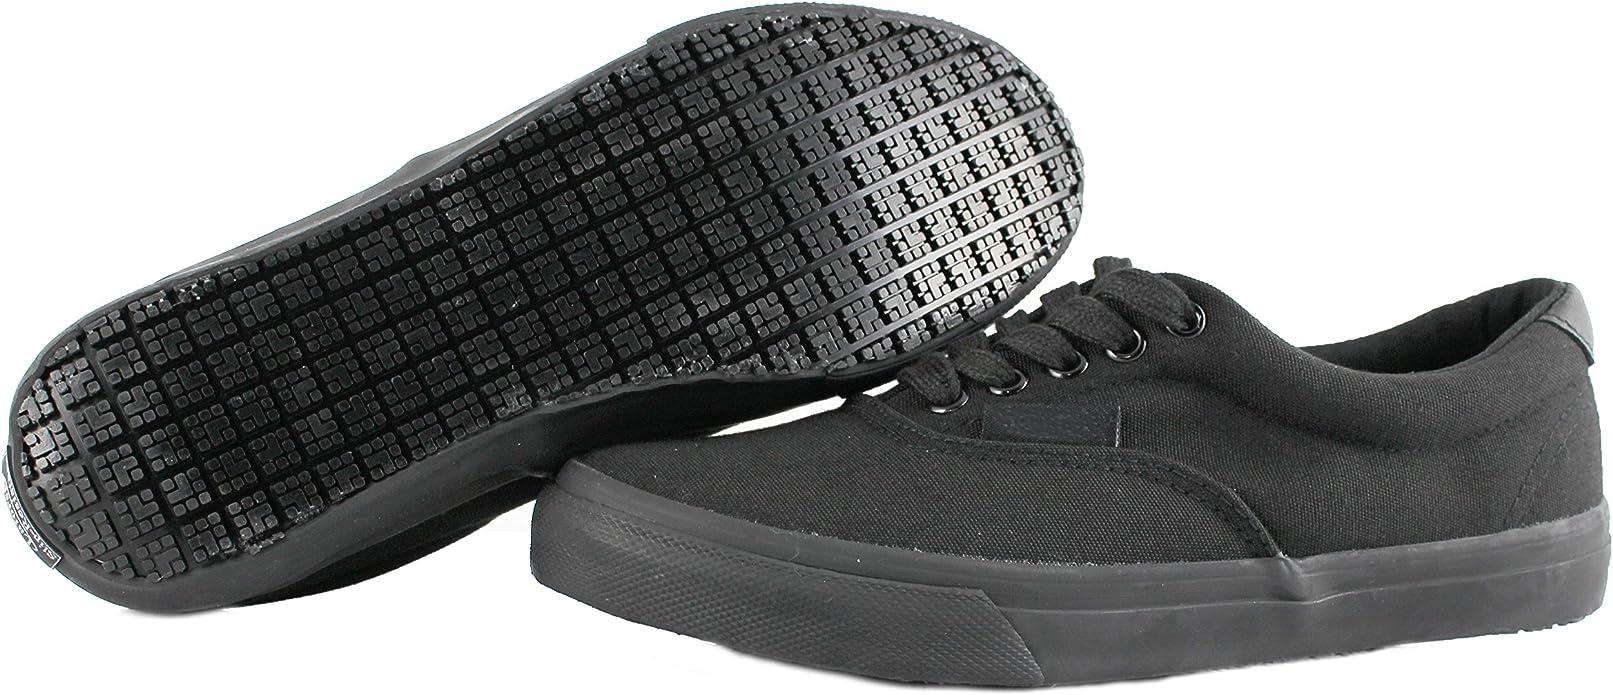 Own Shoe Slip Resistant Black Sunbrella